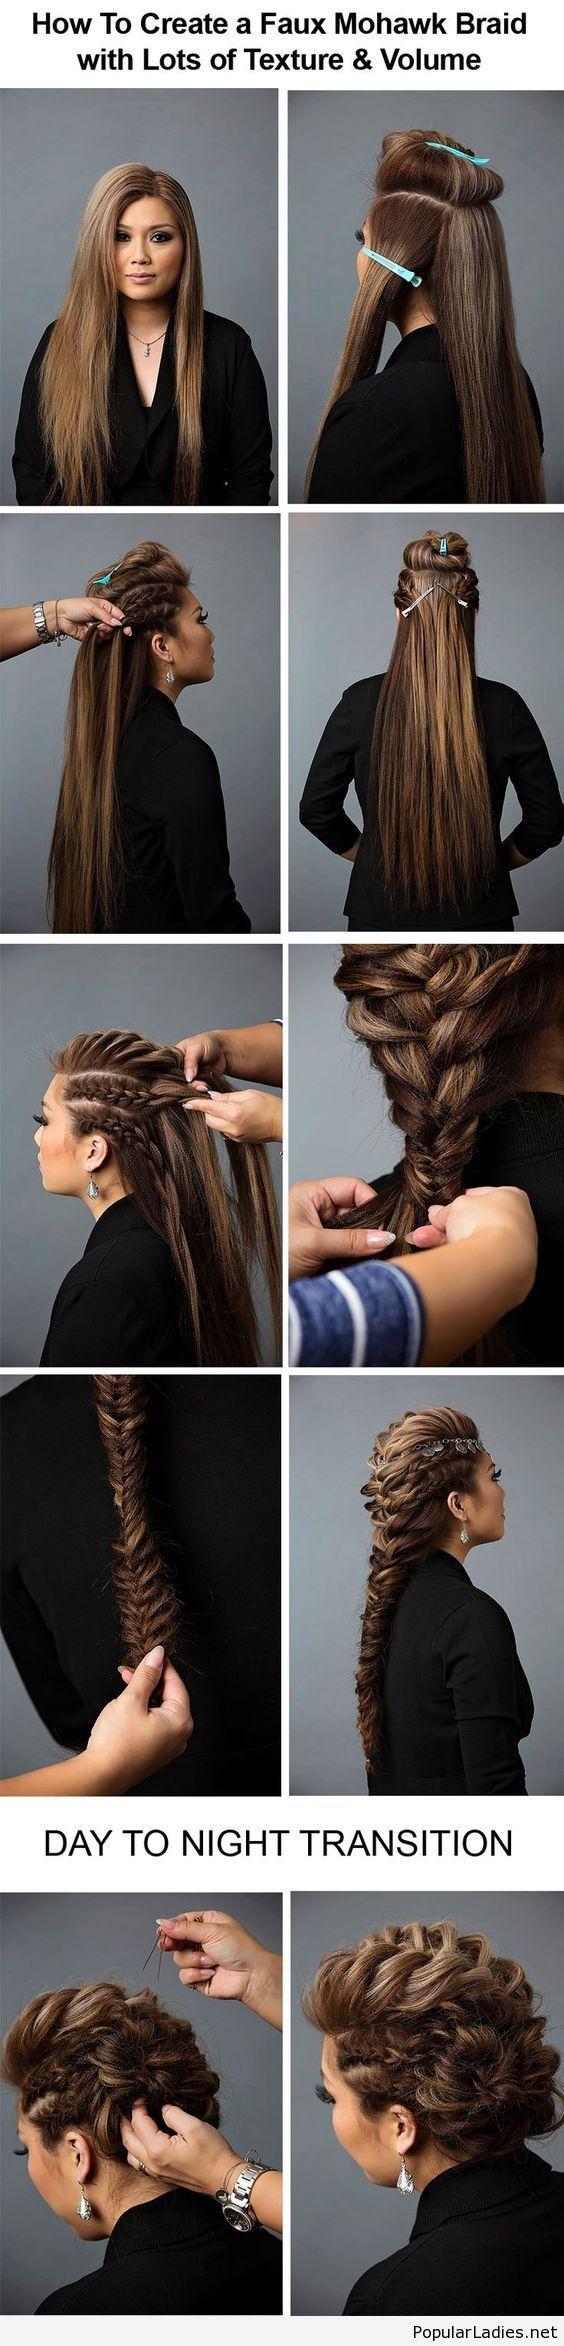 best images about cabello y peinado on pinterest